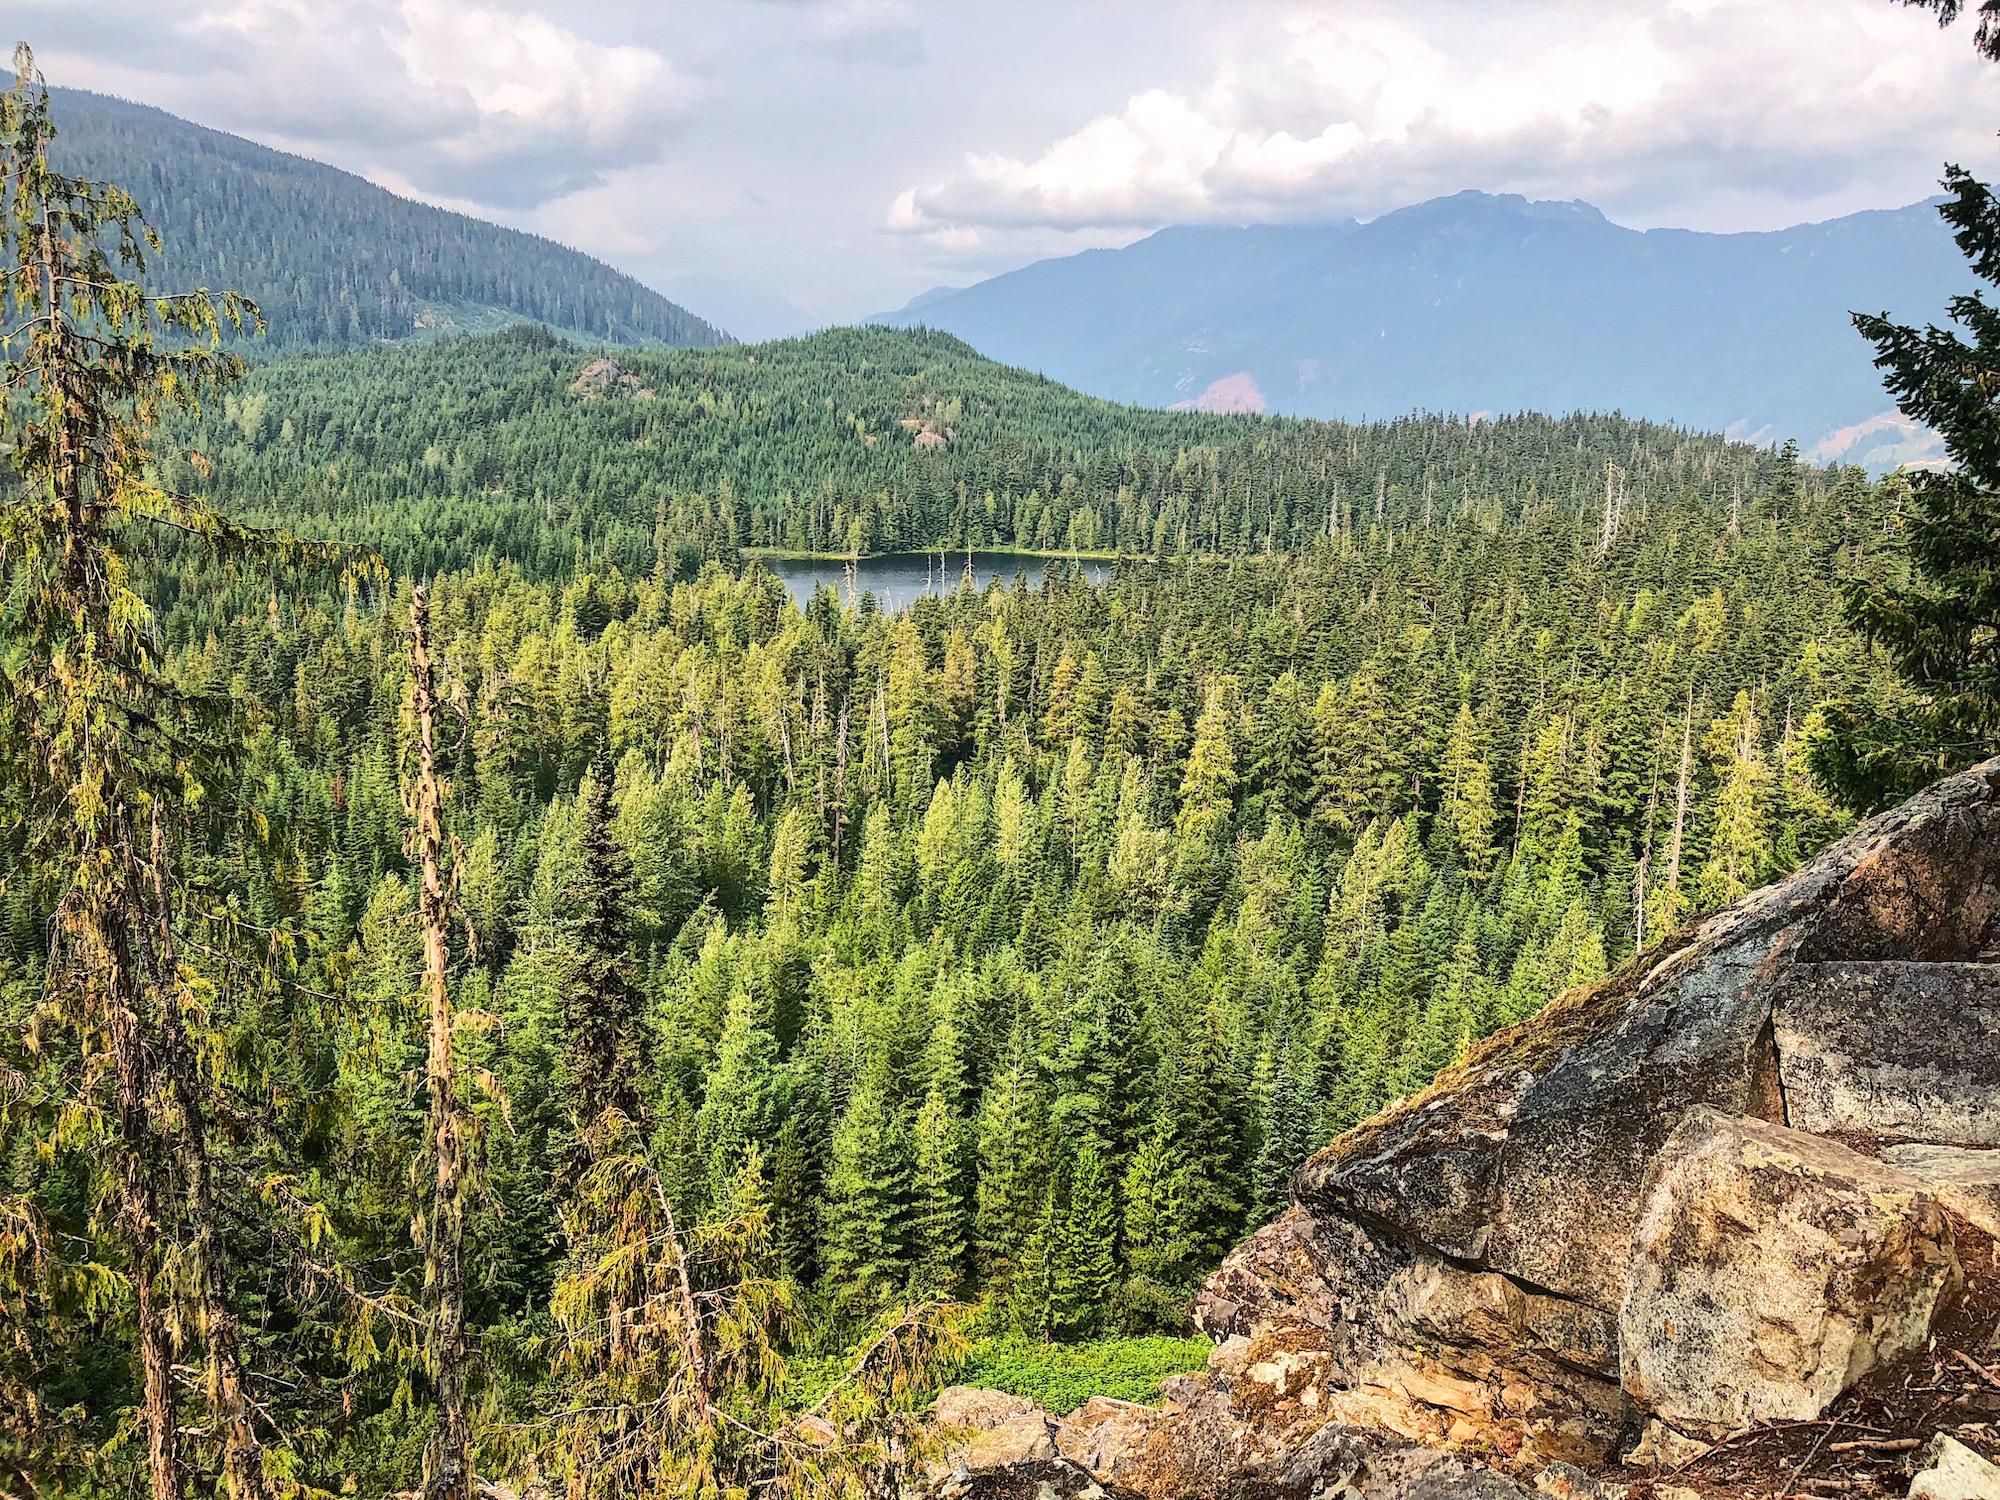 Ancient Cedars Trail Hike in Beautiful British Columbia via @outandacross